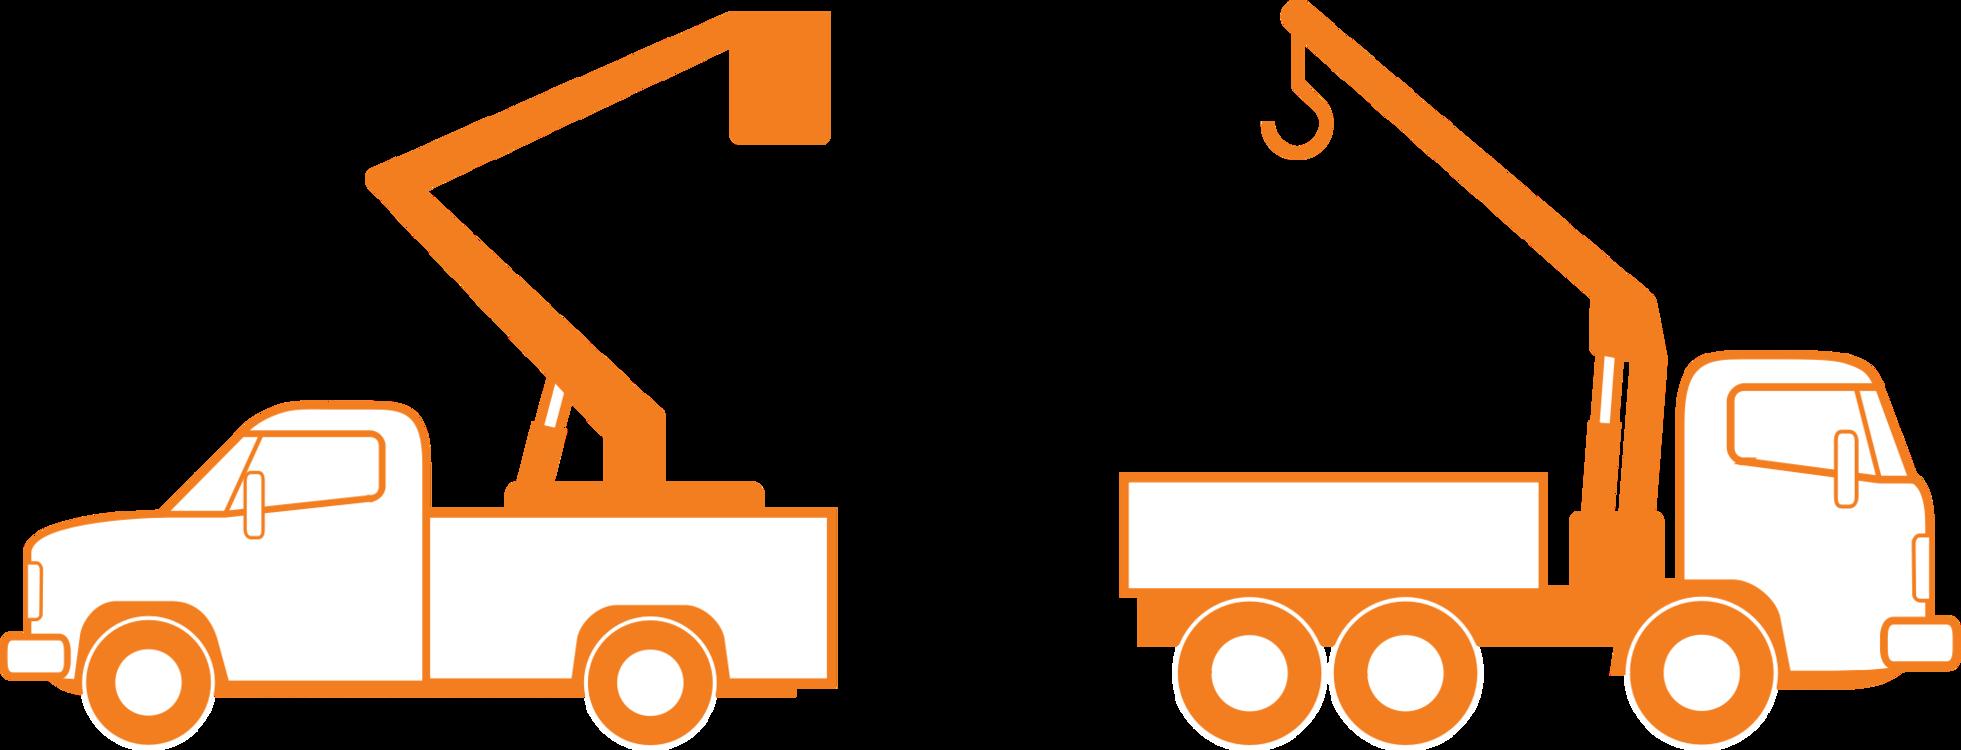 Angle,Area,Orange